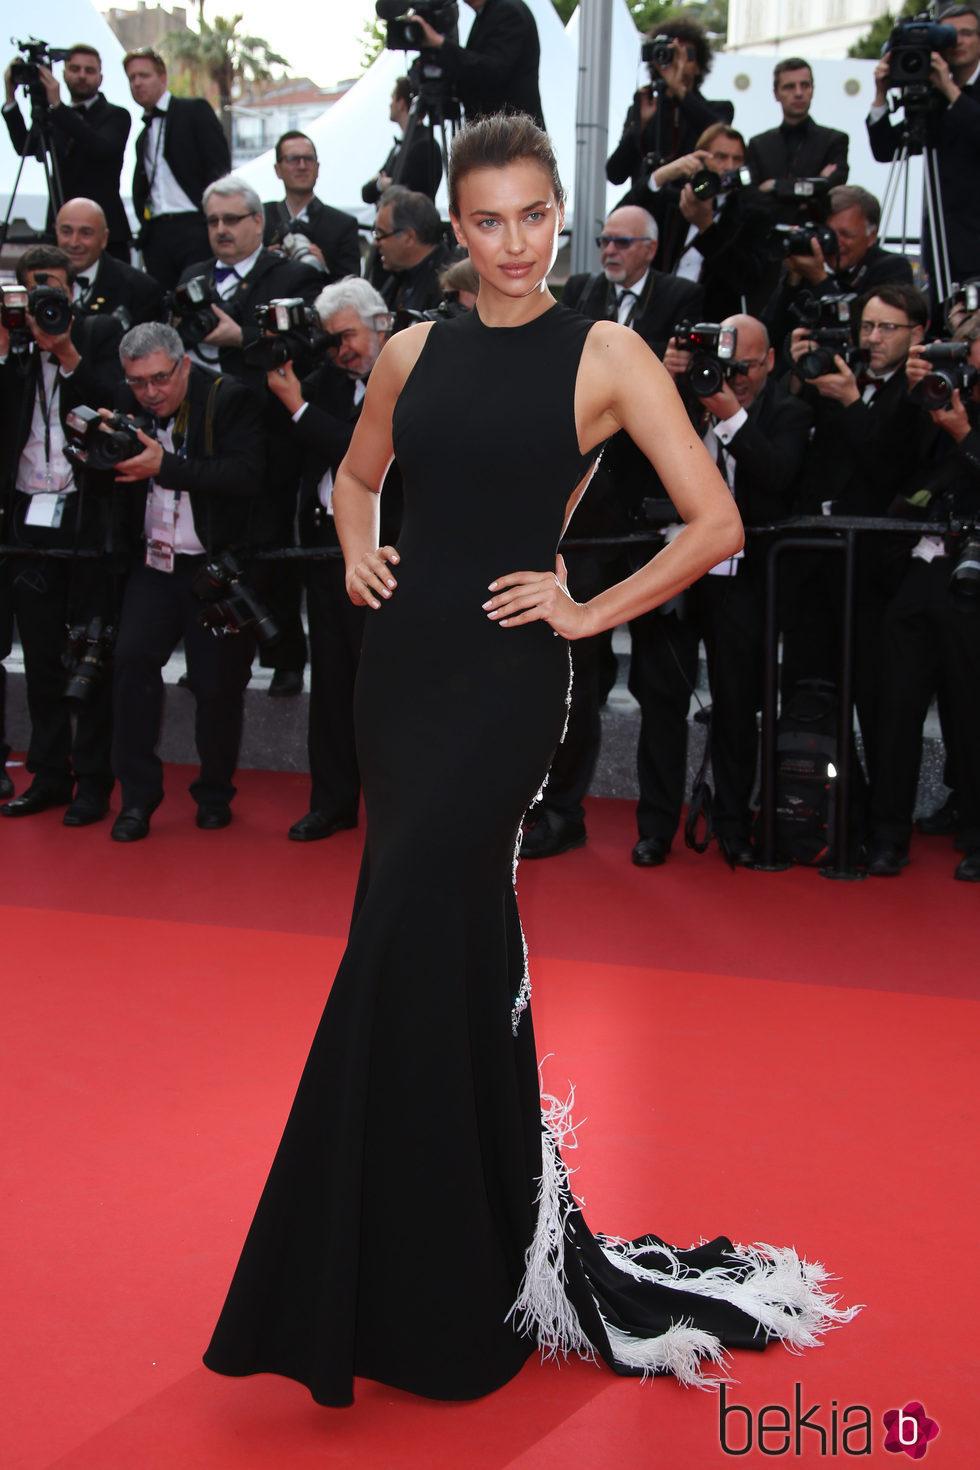 Irina Shayk en la premiere 'The Unknown girl' en el Festival de Cannes 2016